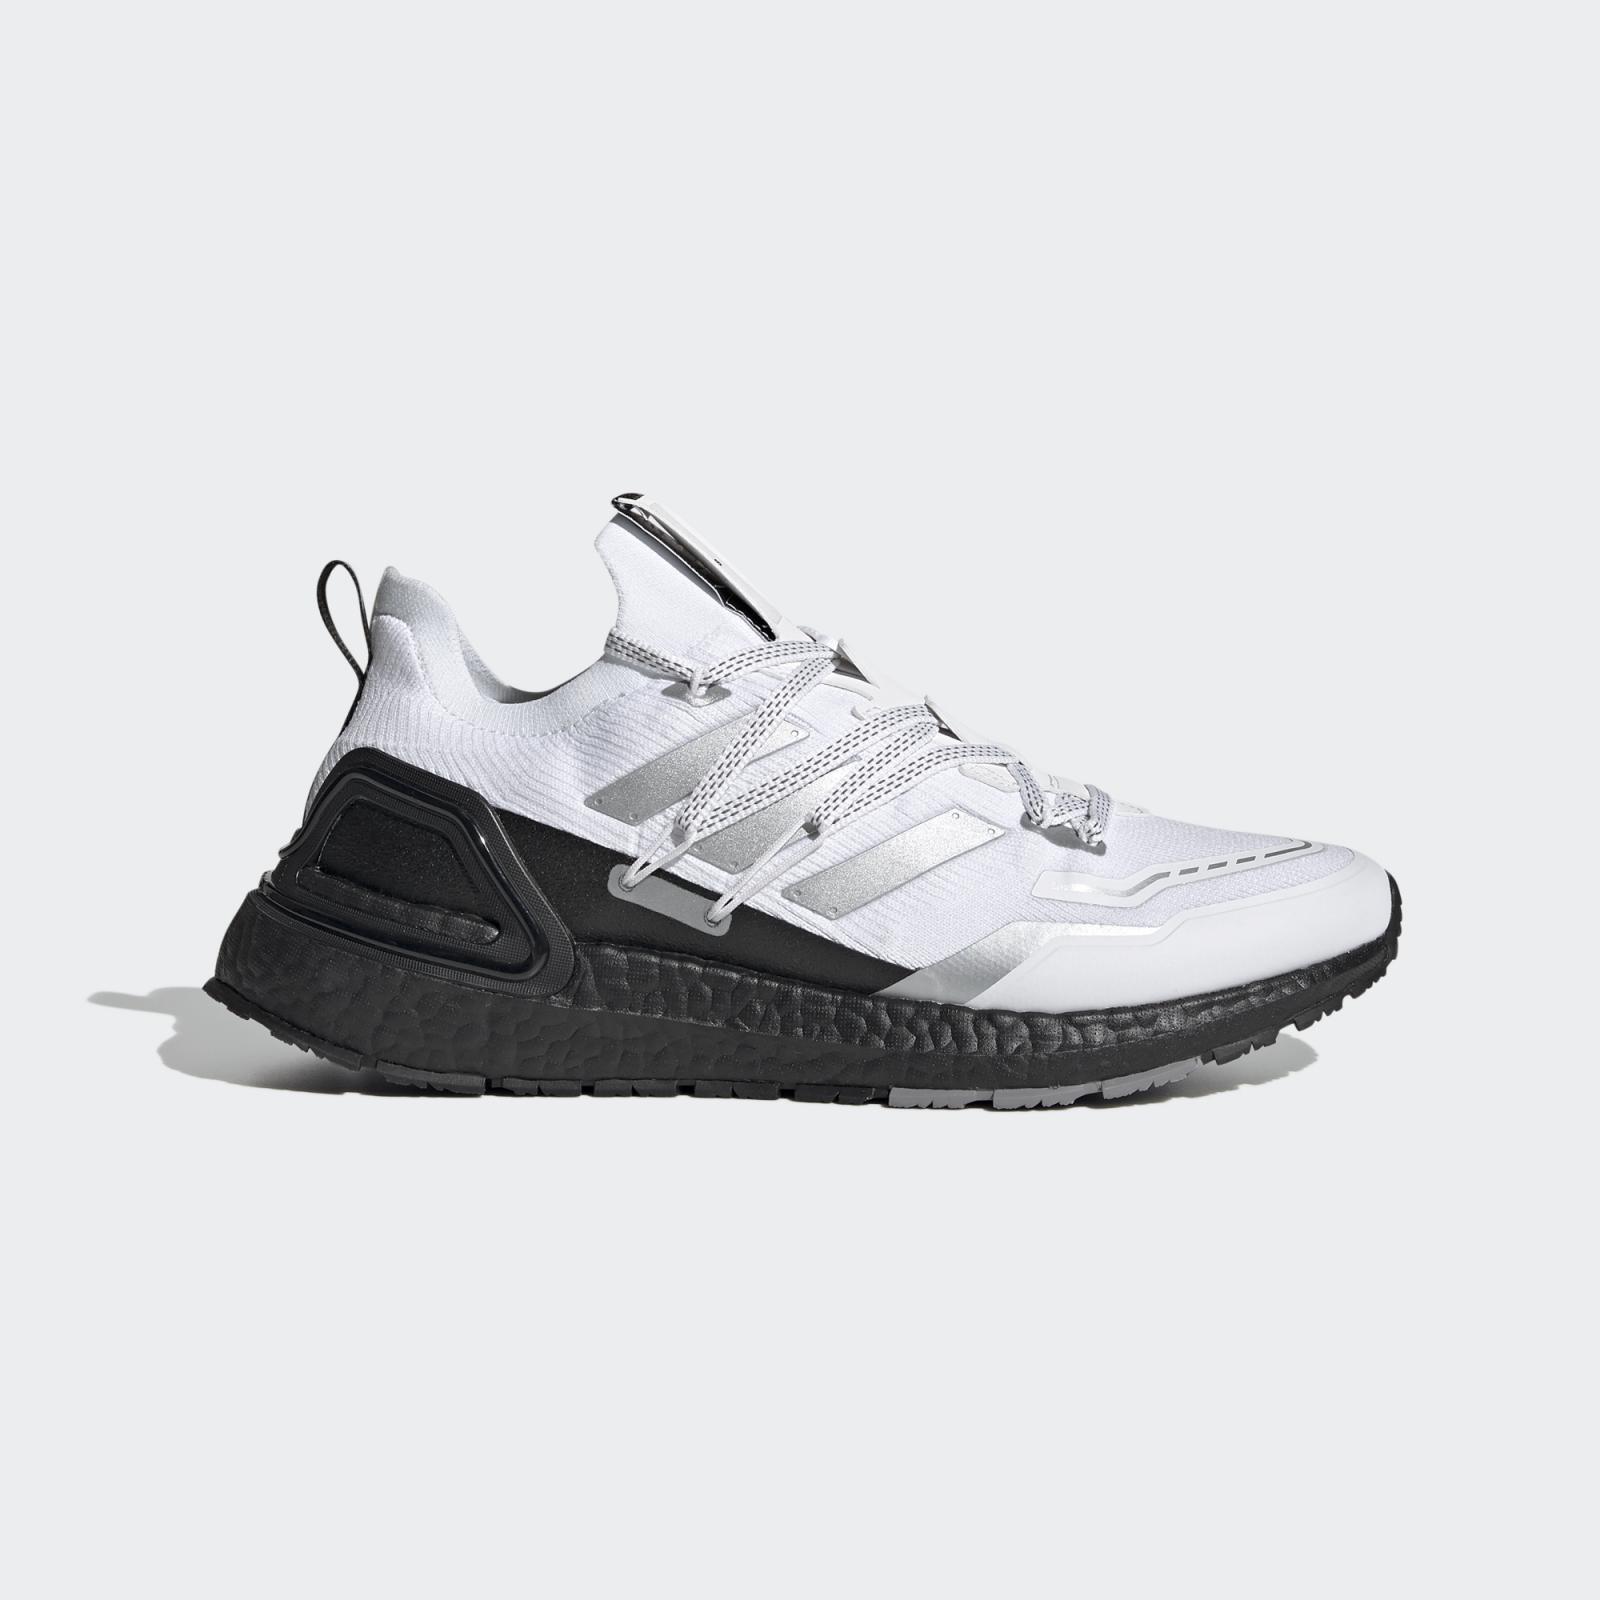 adidas Running发布全新白/银/一号黑色UltraBOOST 20 Lab